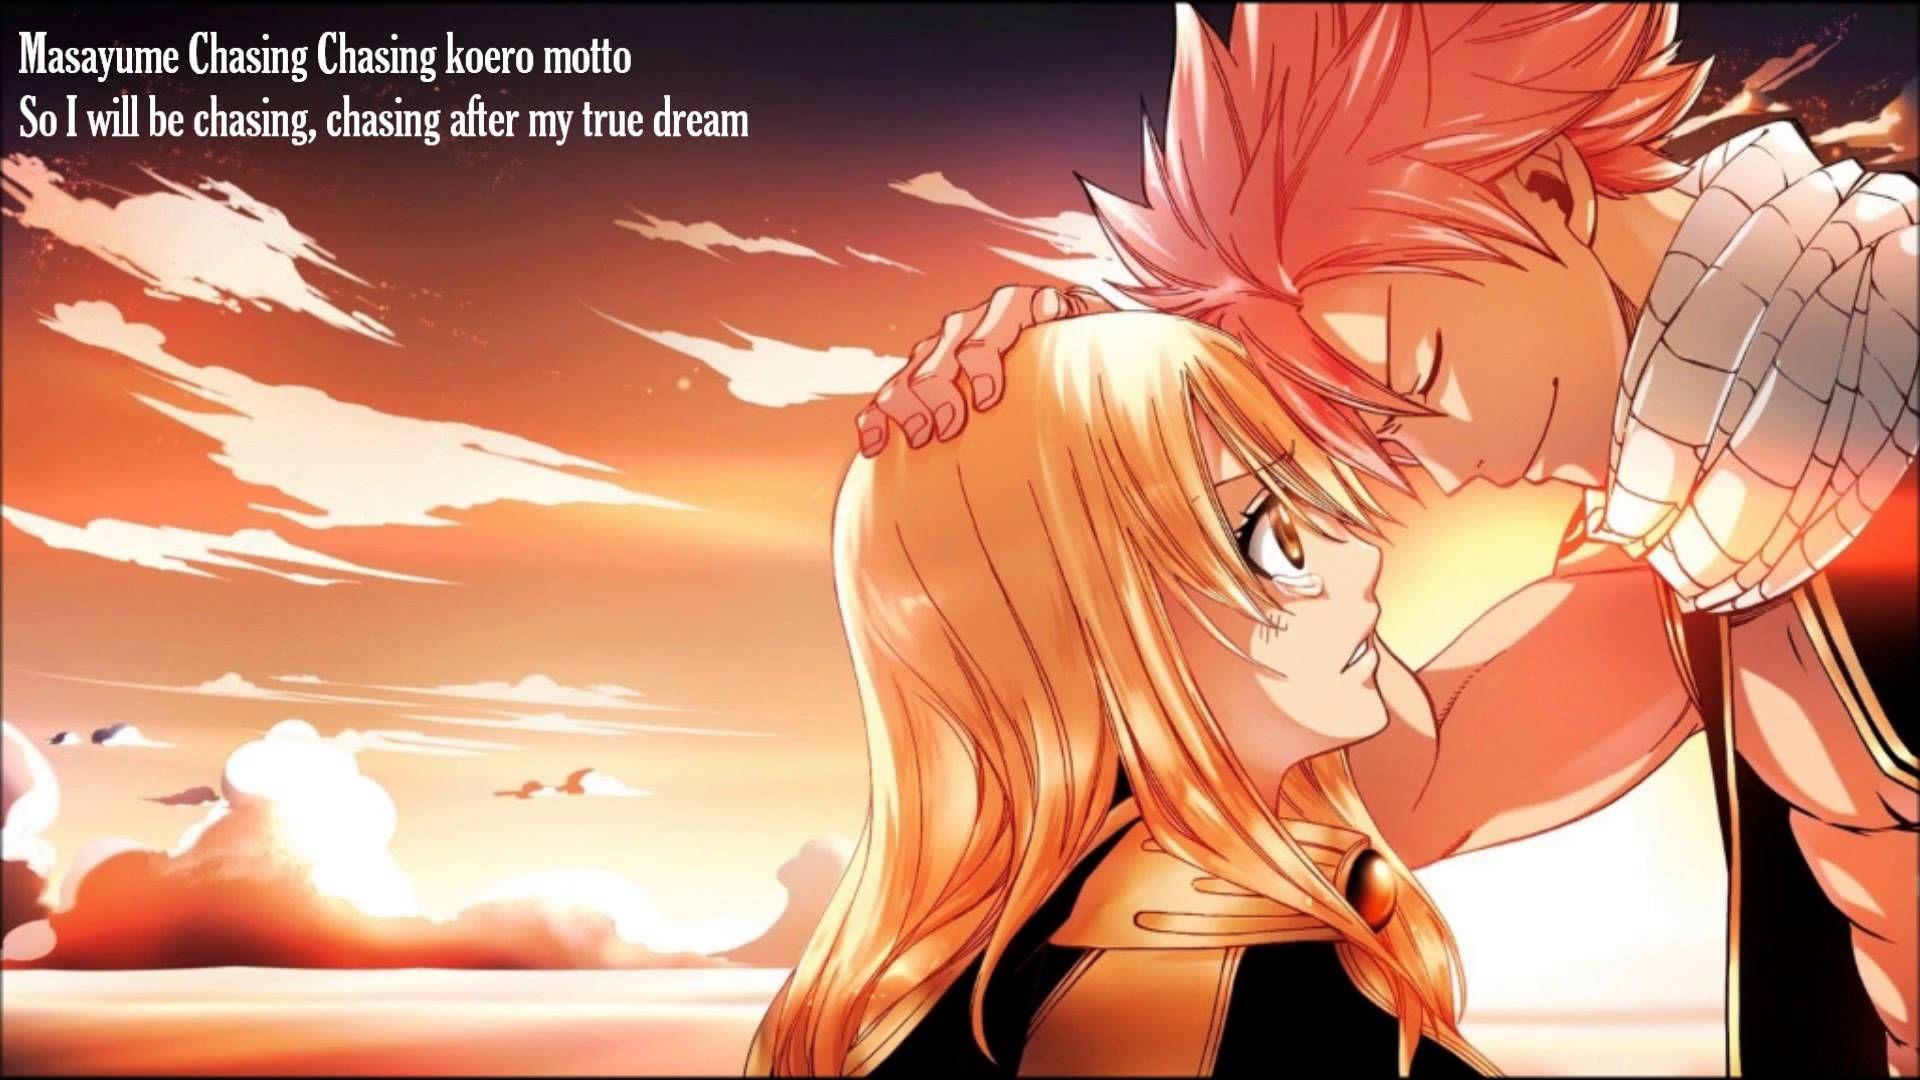 Nightcore Masayume Chasing Fairy Tail Lucy Fairy Tail Nalu Fairy Tail Images